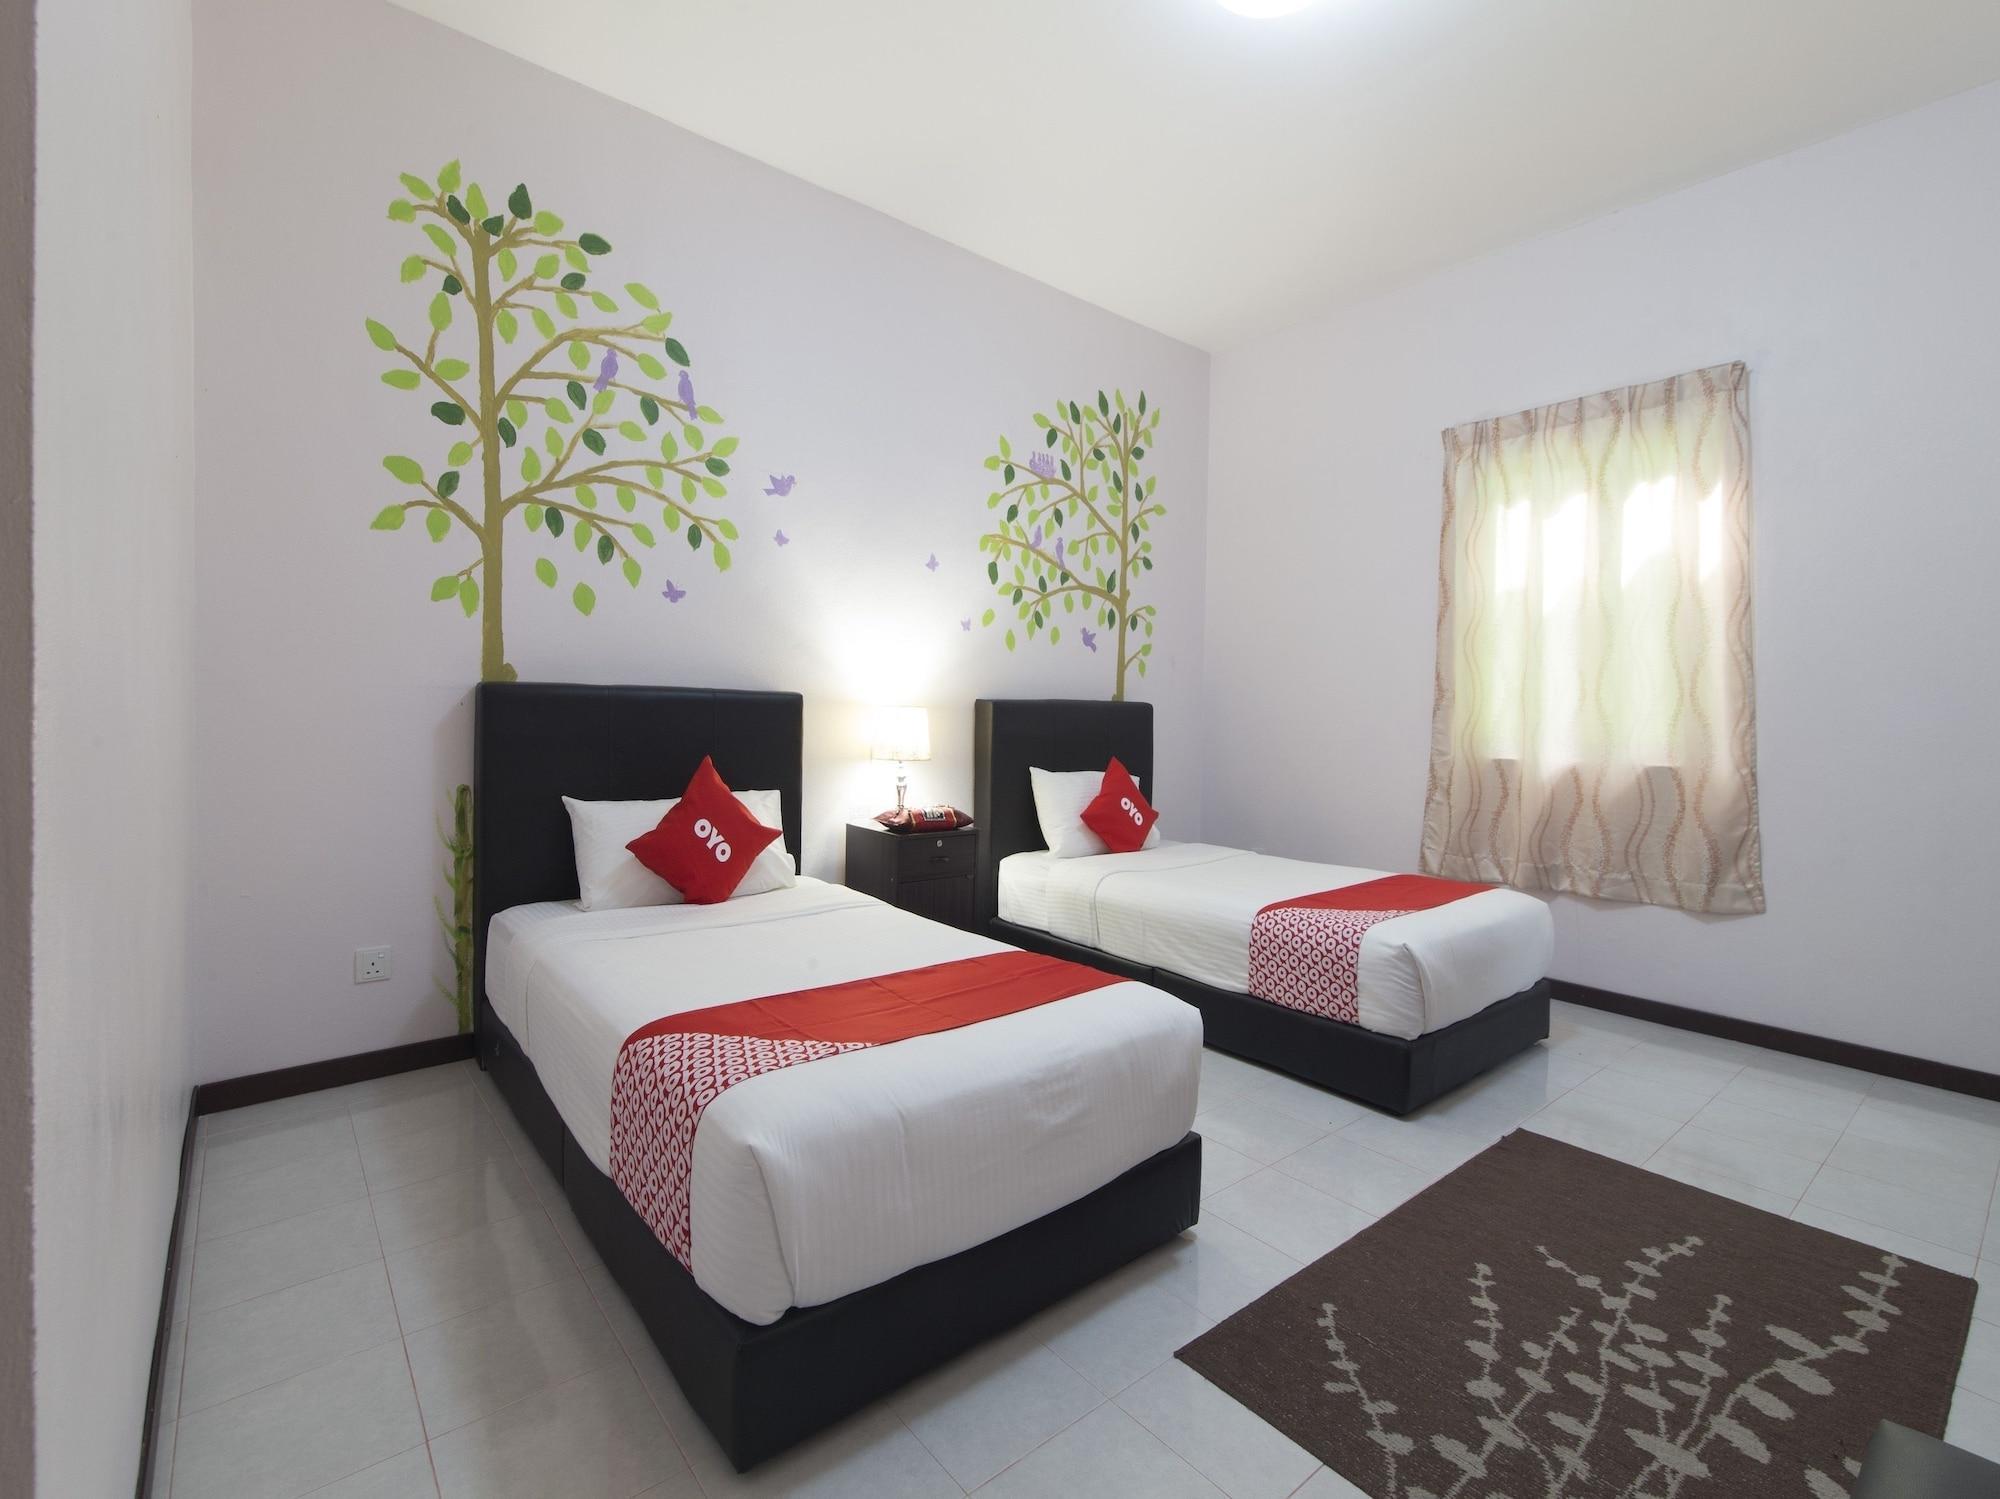 OYO 44124 De Langkawi Resort And Convention Centre, Langkawi